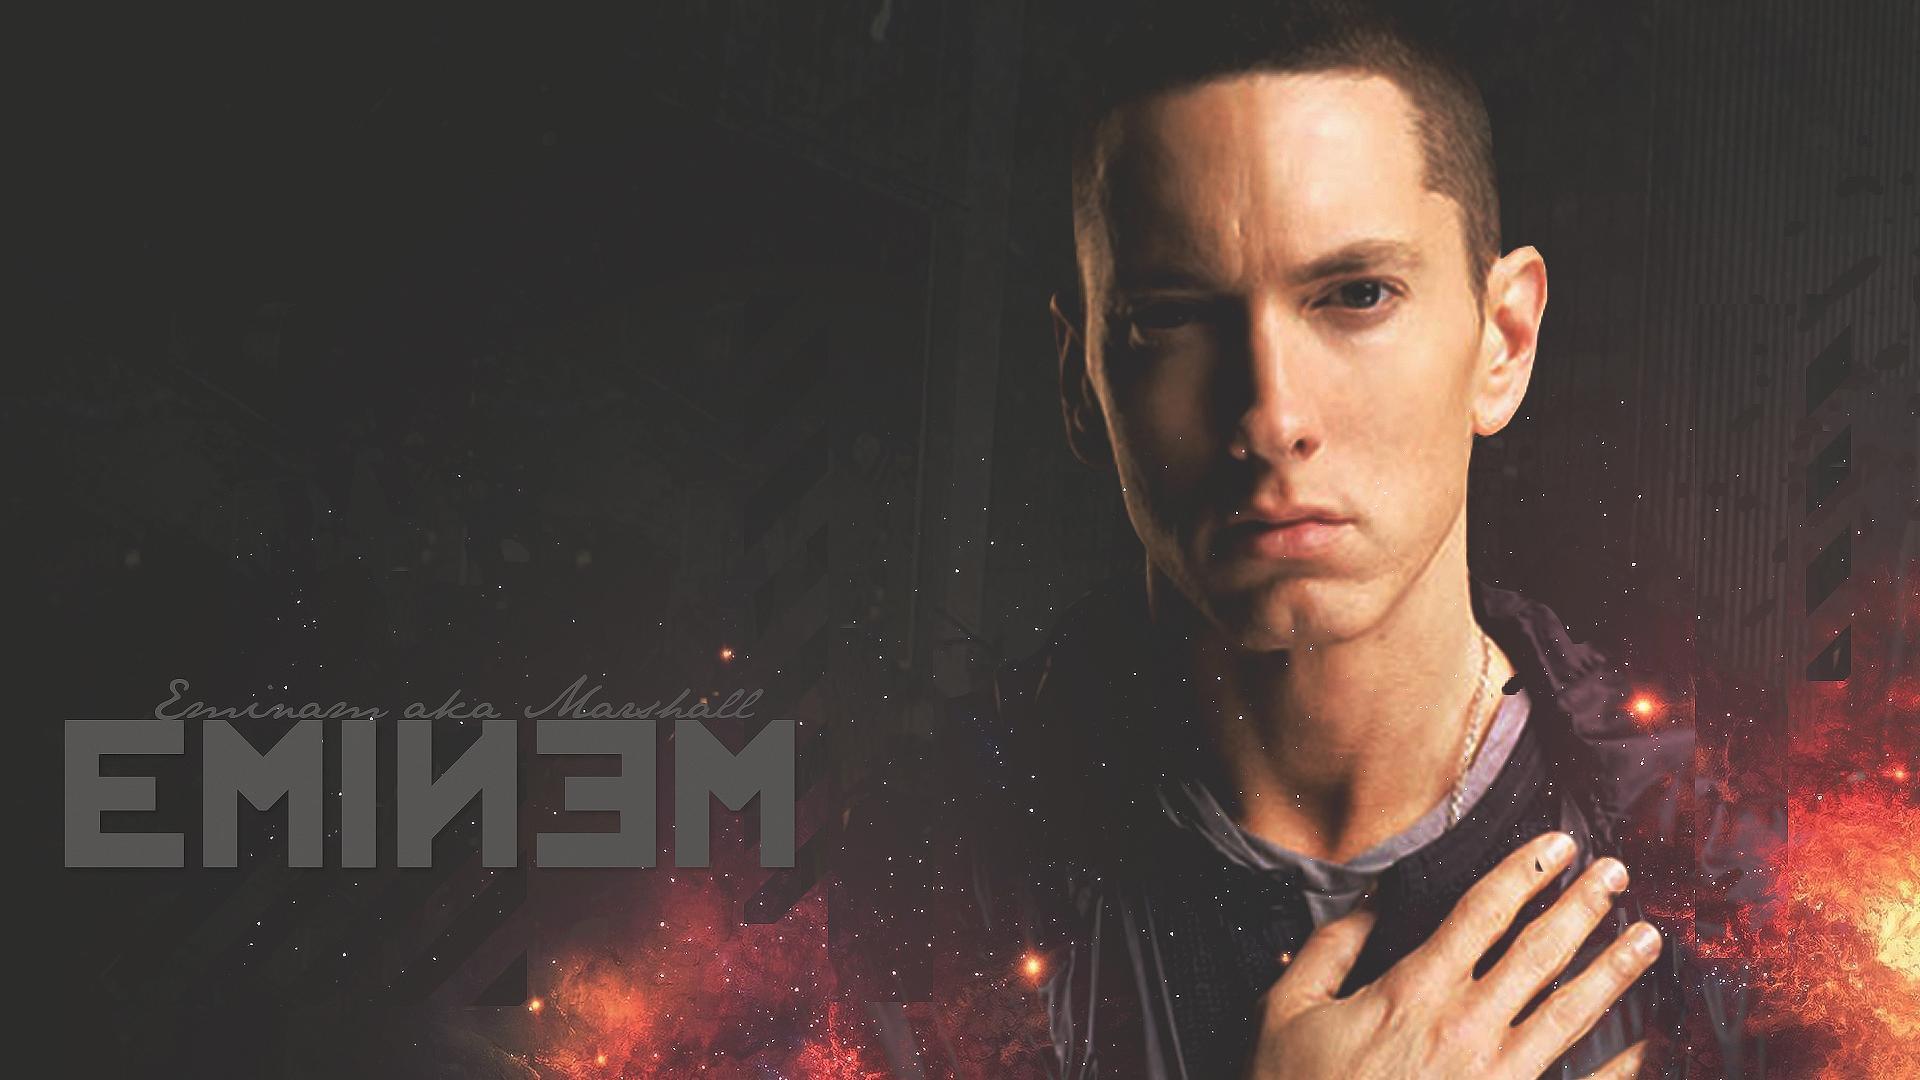 Eminem Wallpaper 15 cool background 25370 HD Wallpaper | Wallroro.